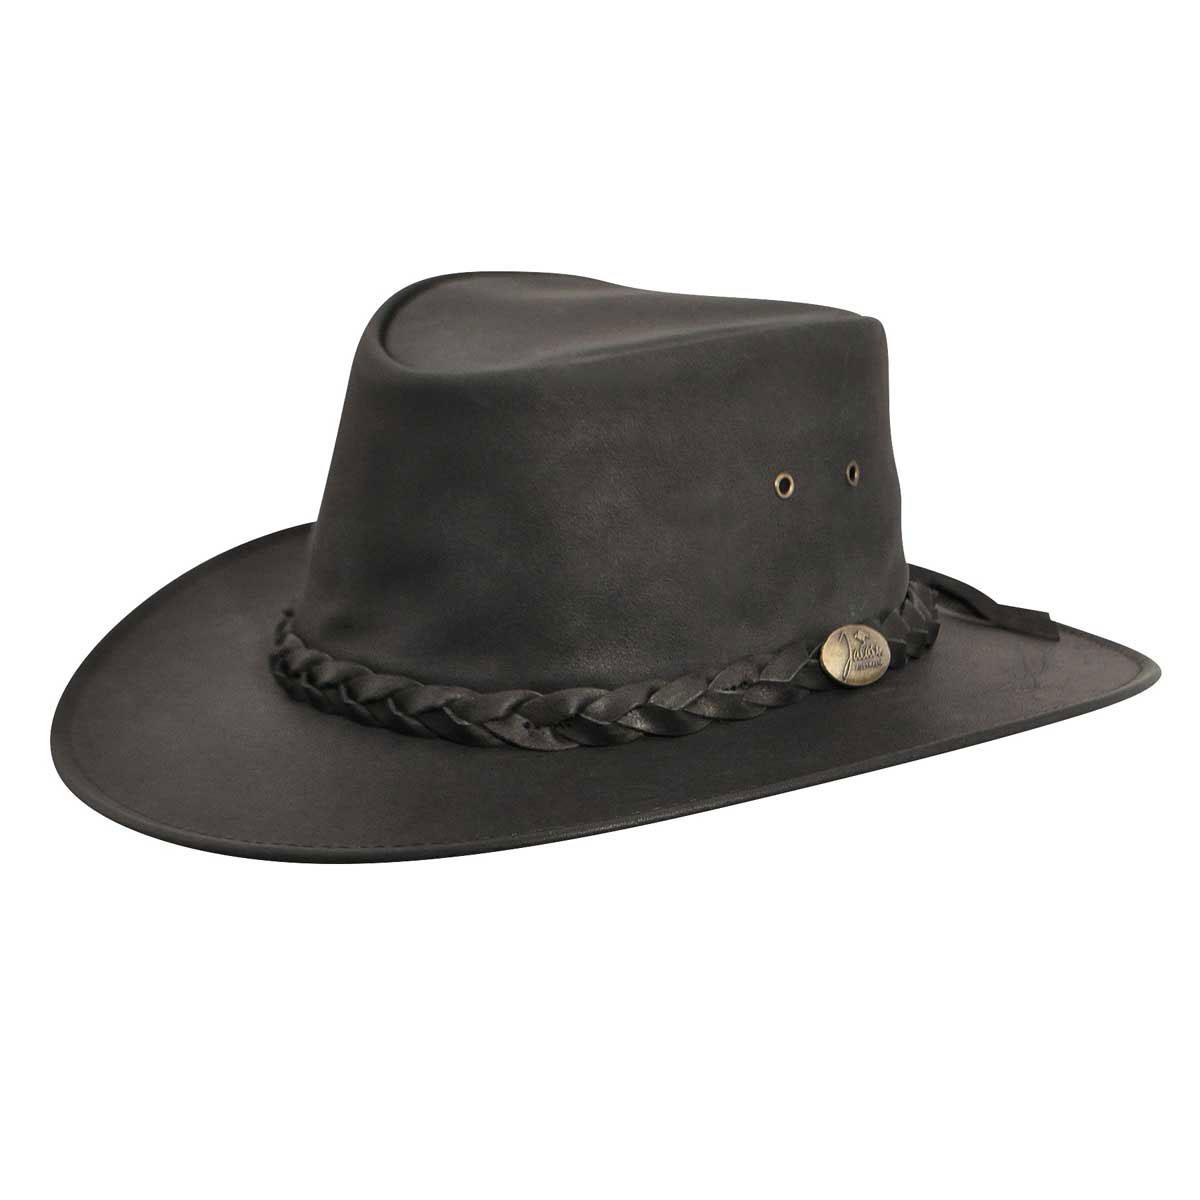 Jacaru Kangaroo Outback Hat in Black